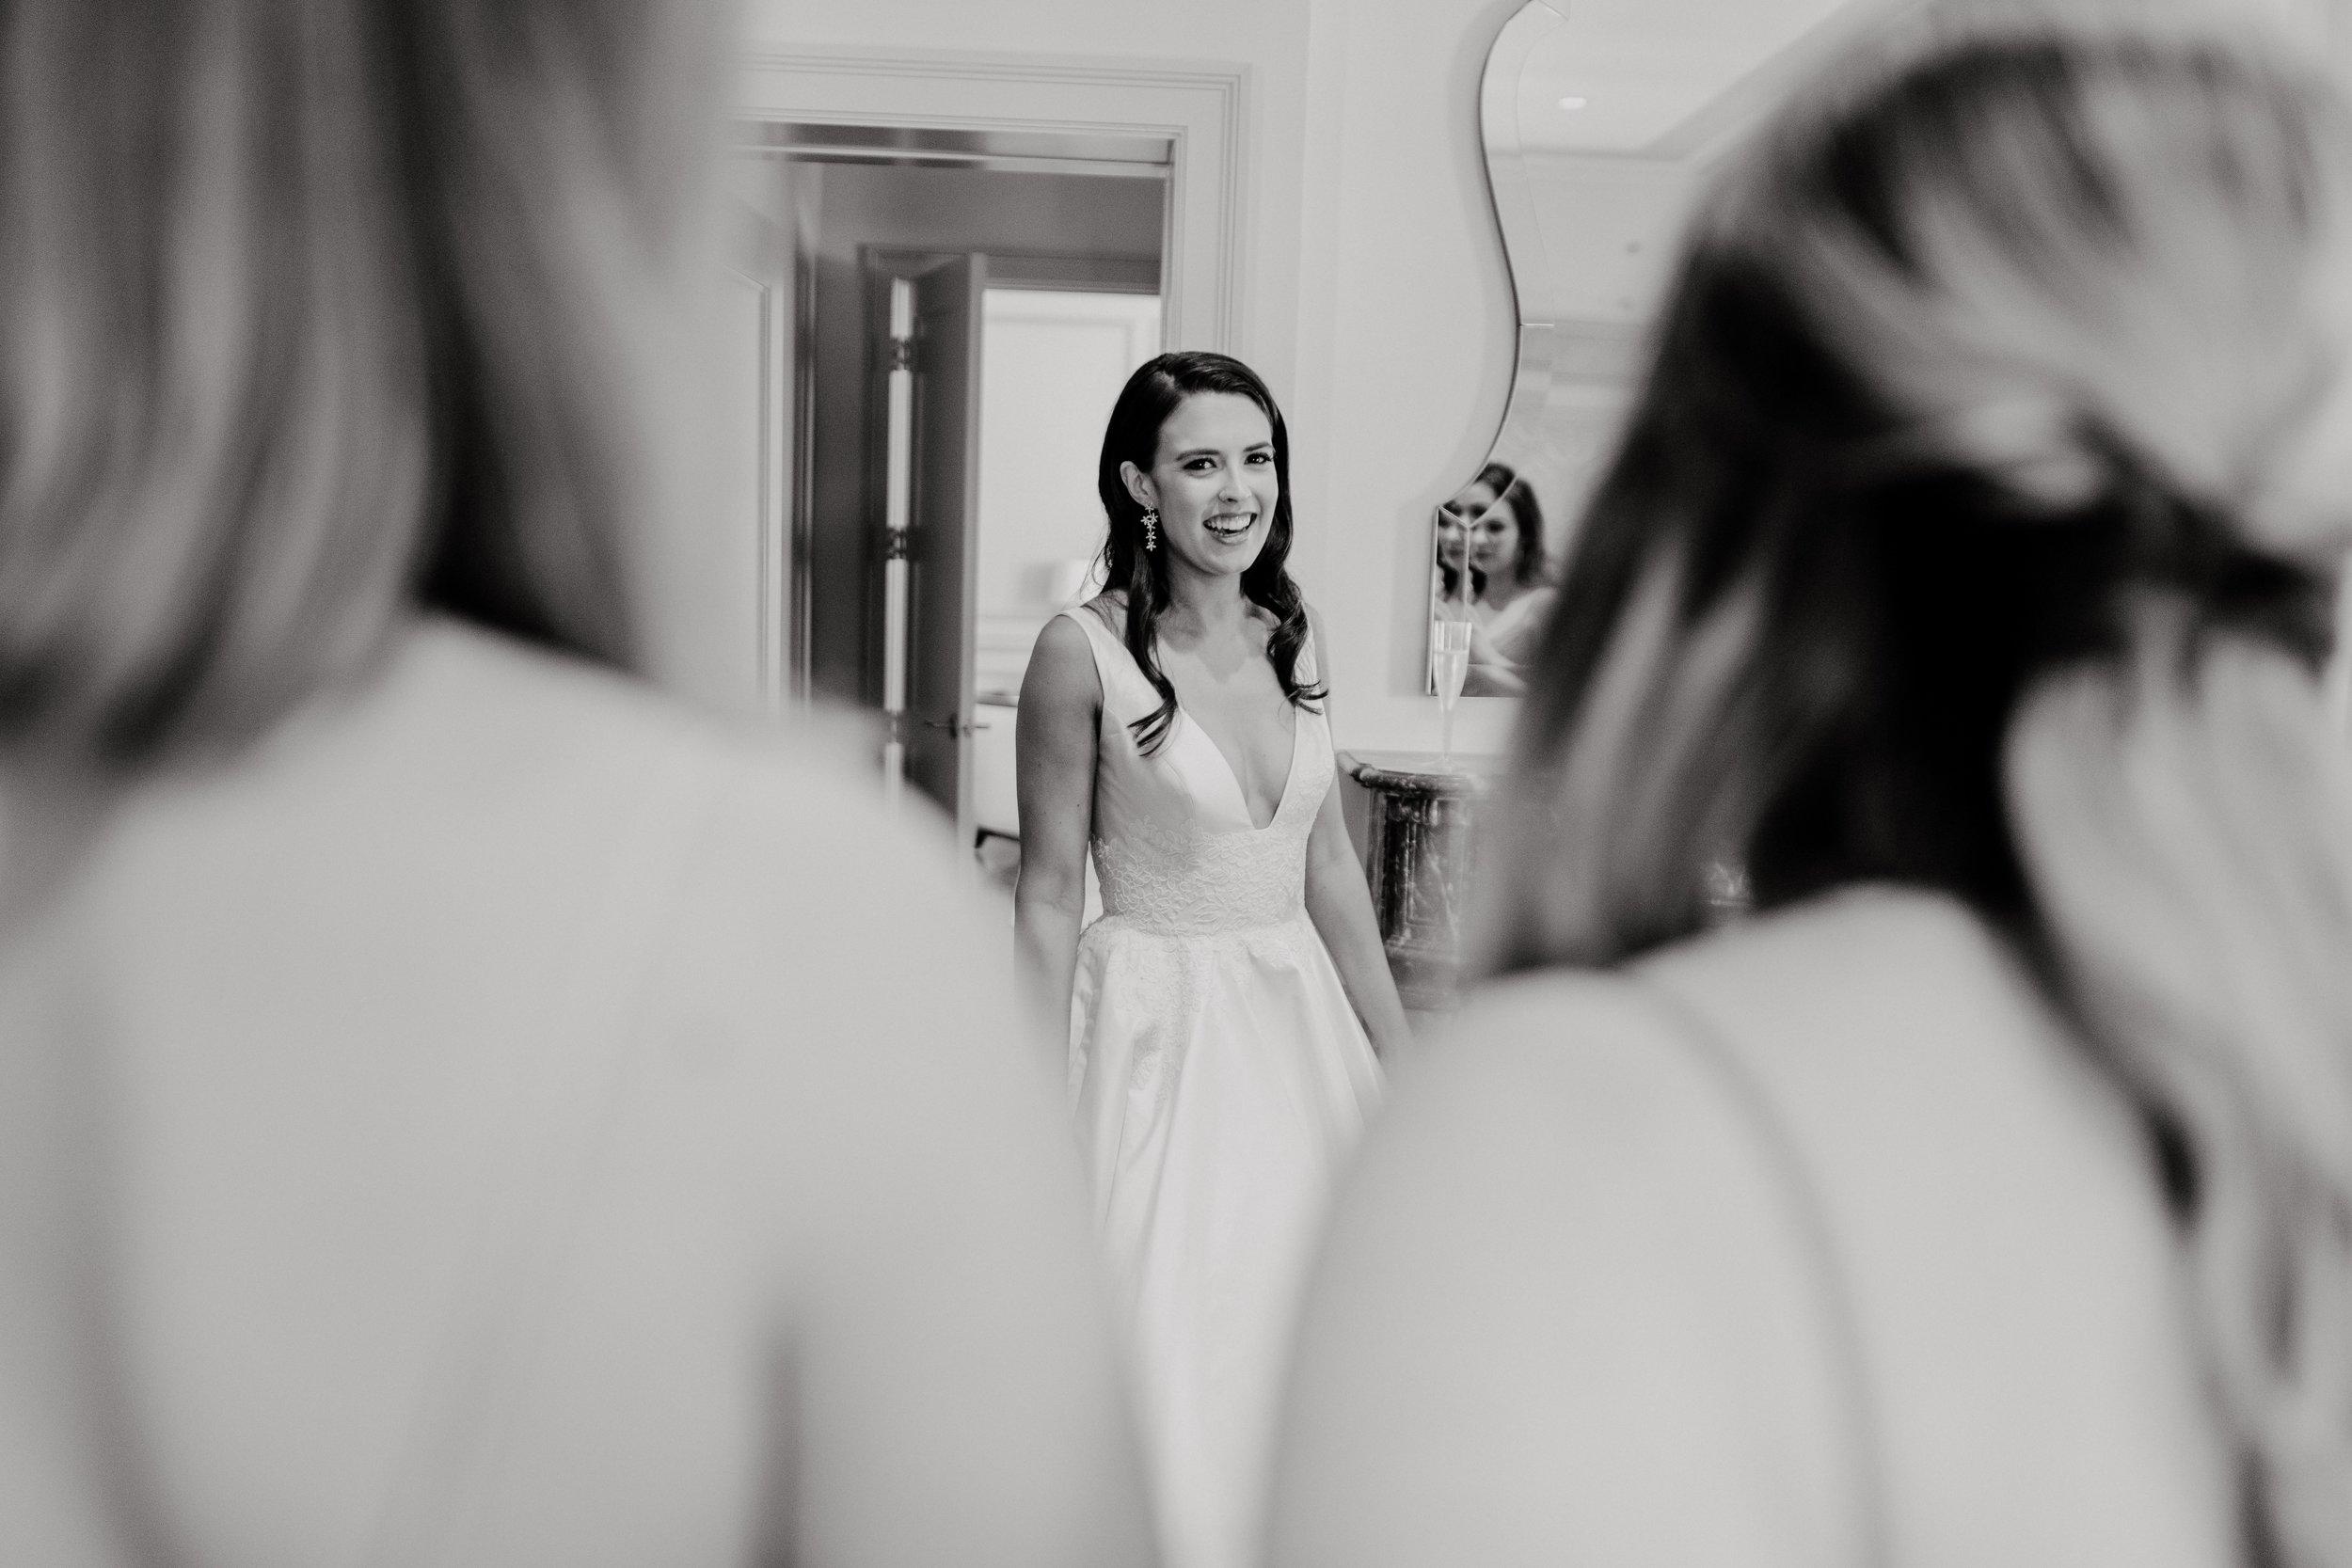 st-anthony-hotel-wedding-photography-10037san-antonio.JPG